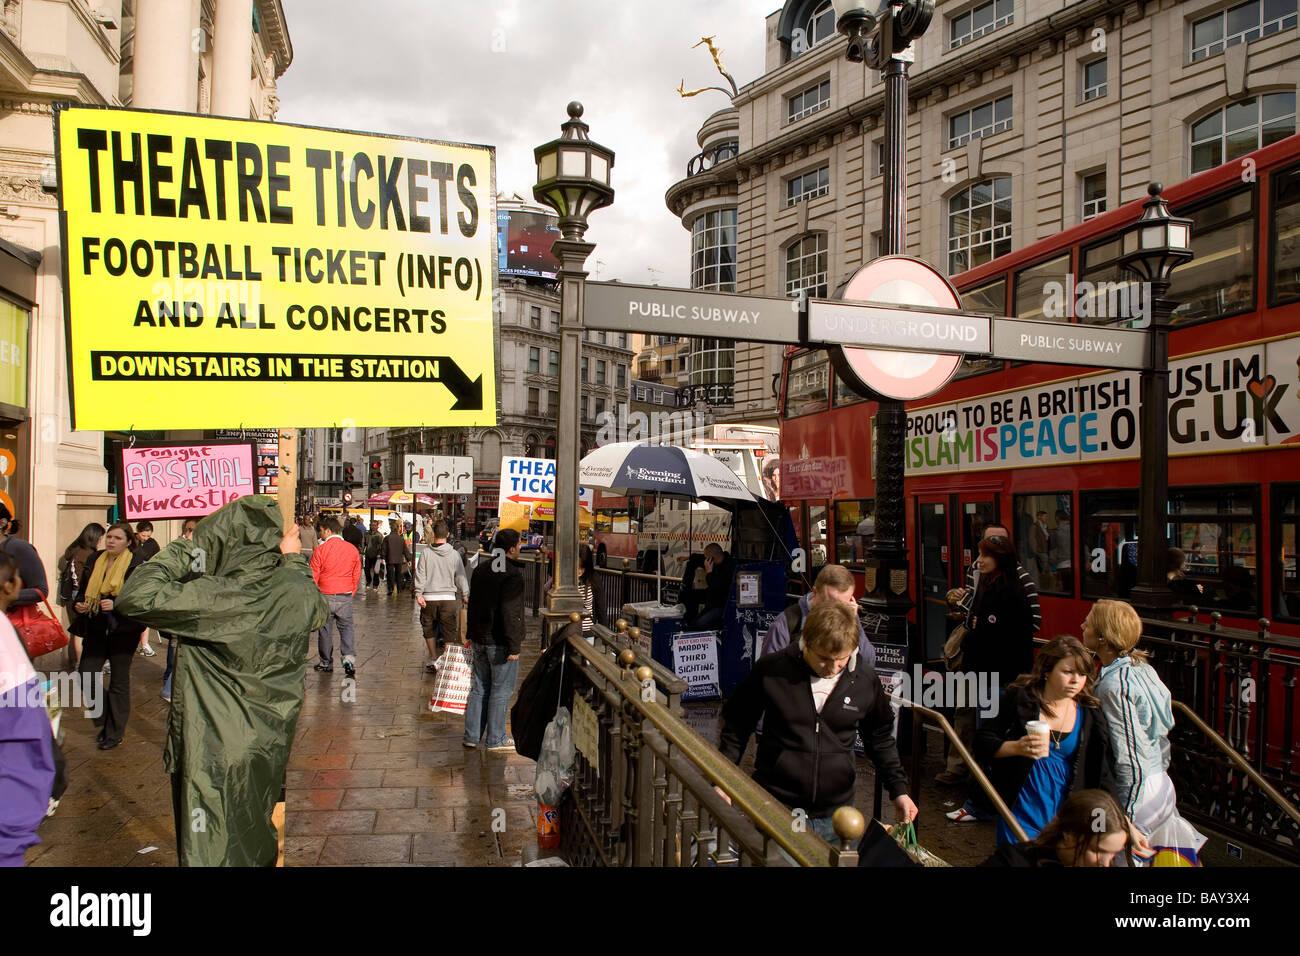 London Underground Station, Picadilly Circus, London, England, Europe - Stock Image